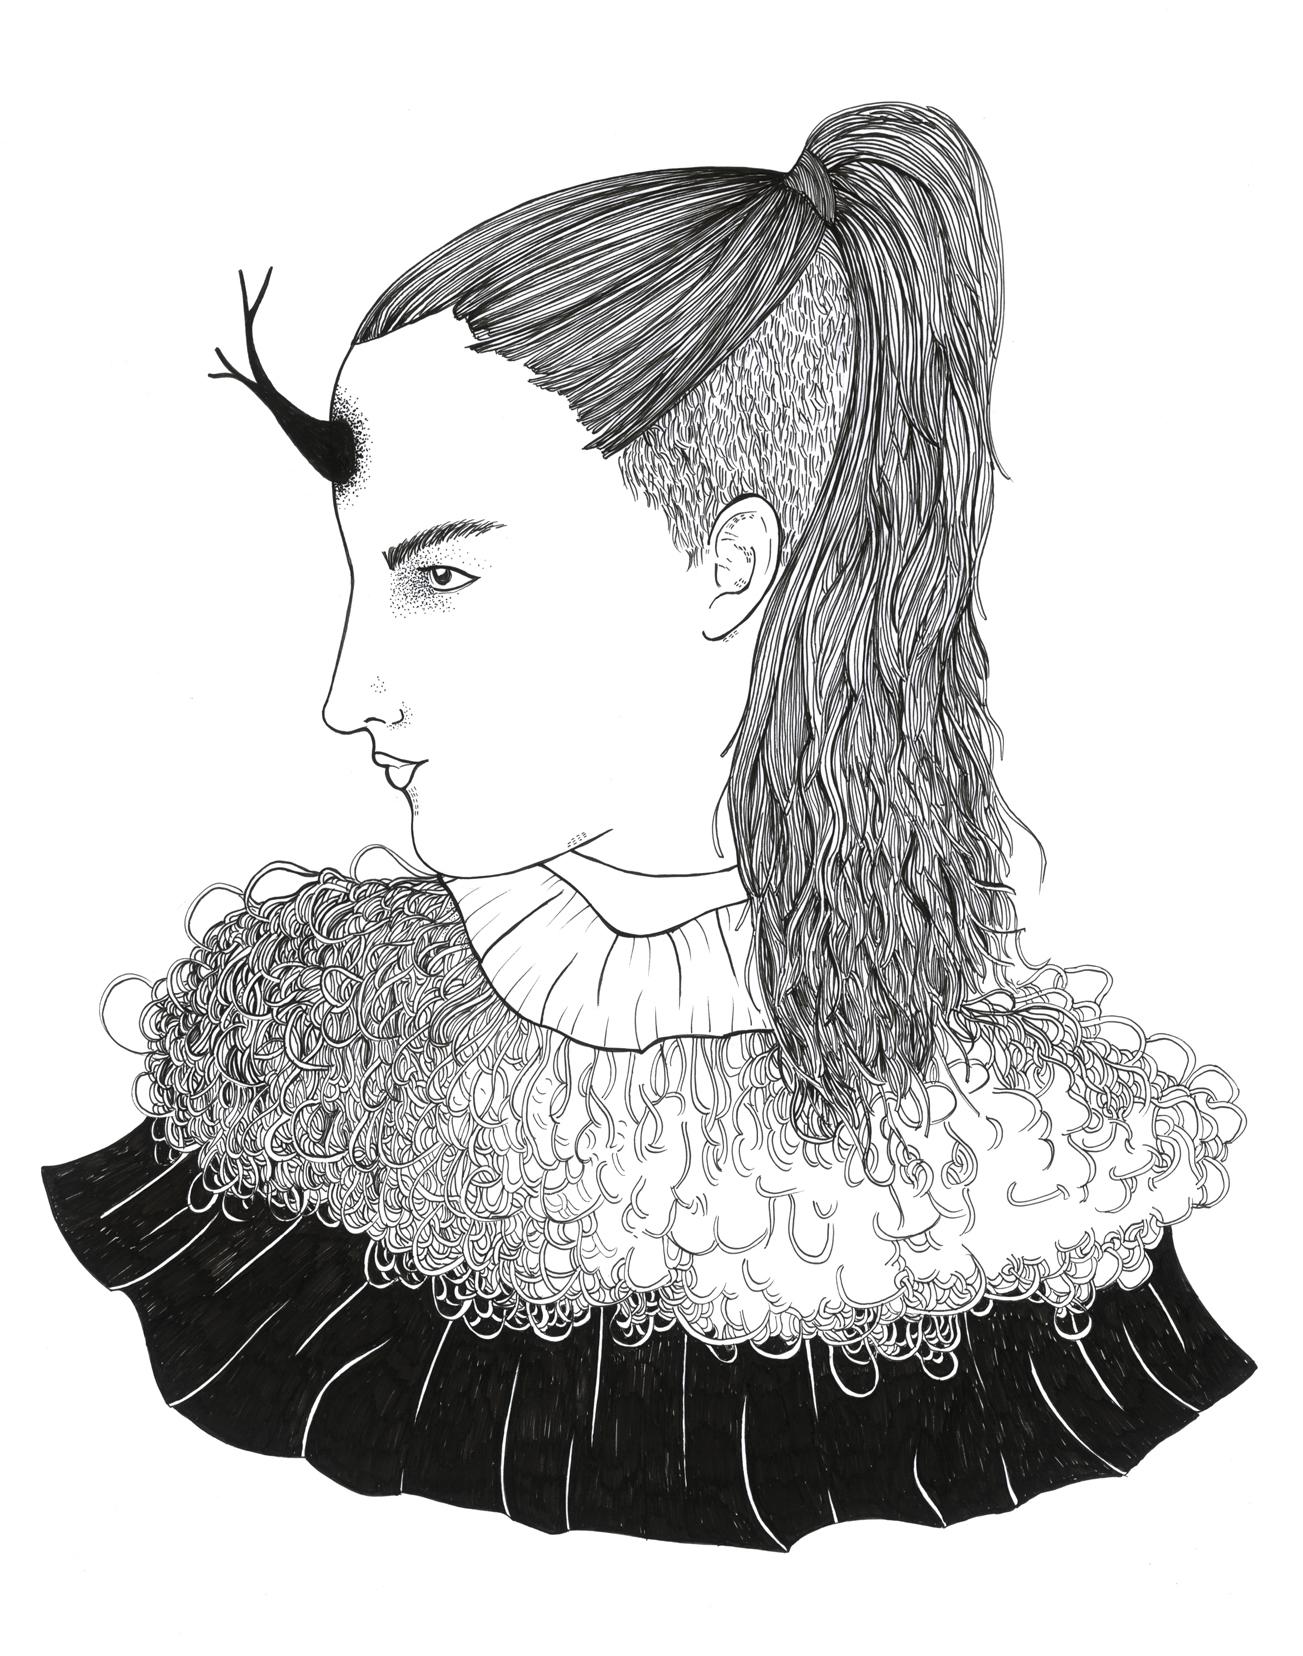 Entrevista a la ilustradora chilena Carola Josefa